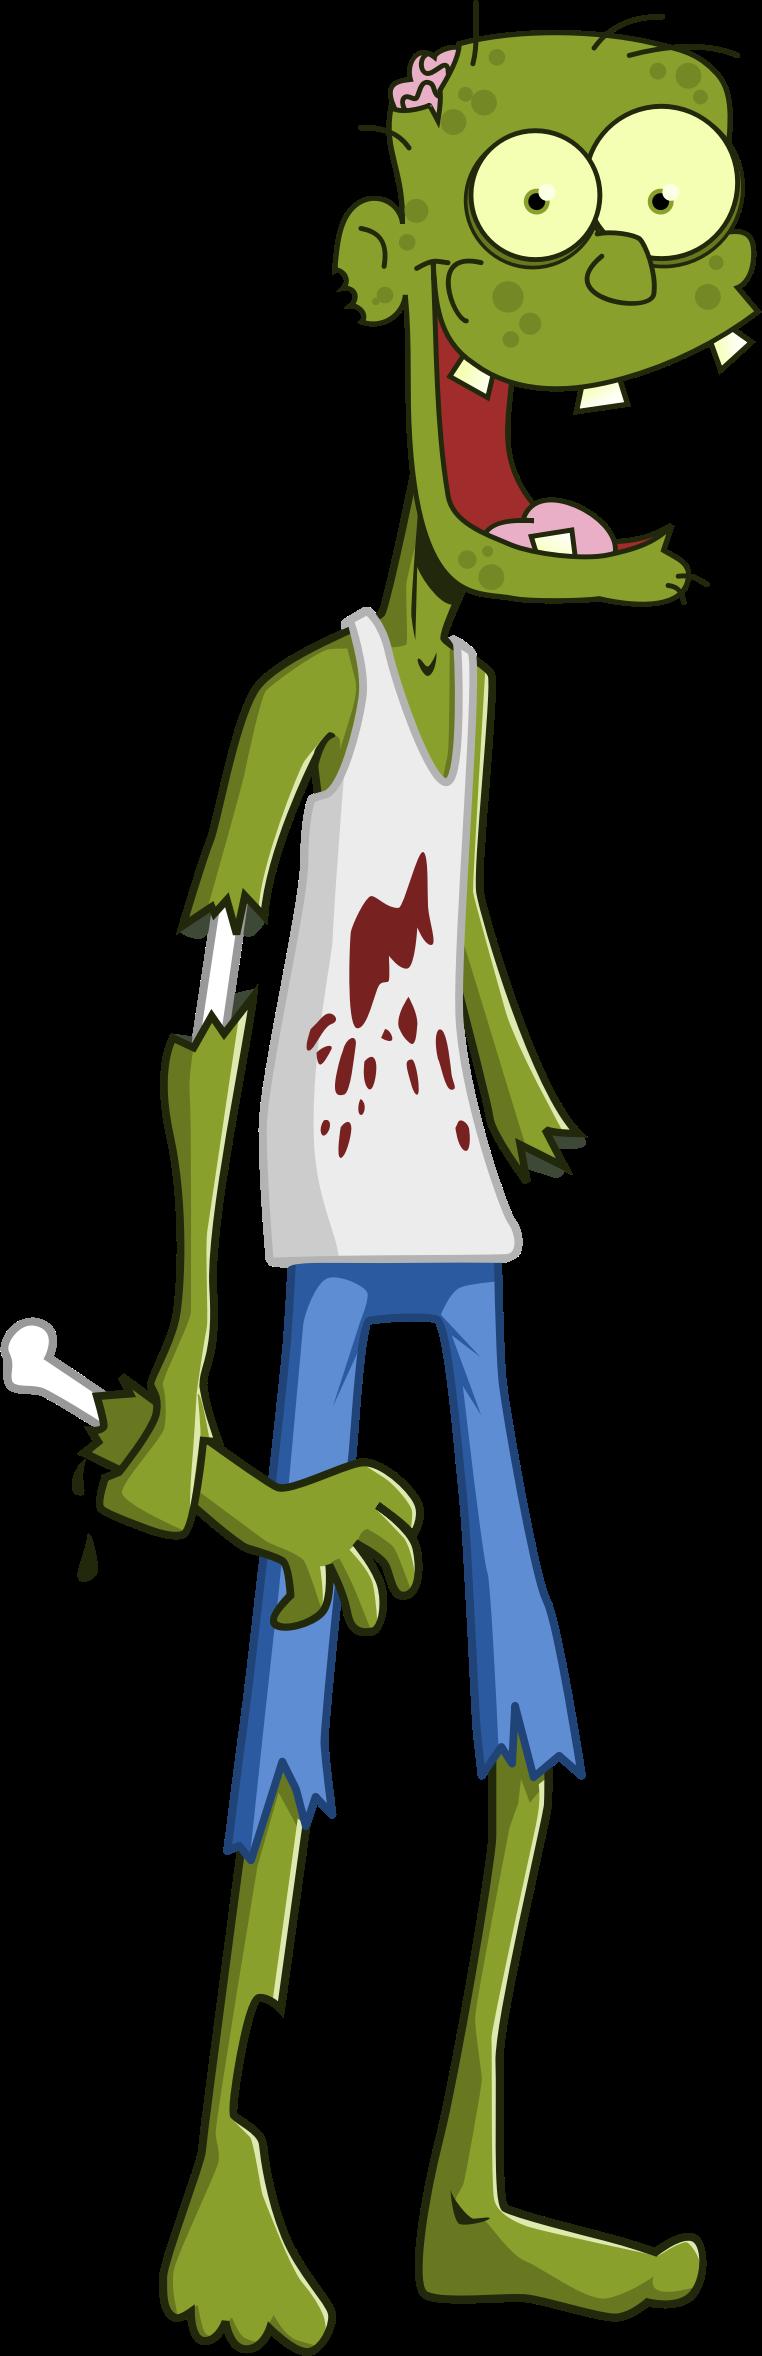 Zombie clipart zombie brain. Cartoon big image png